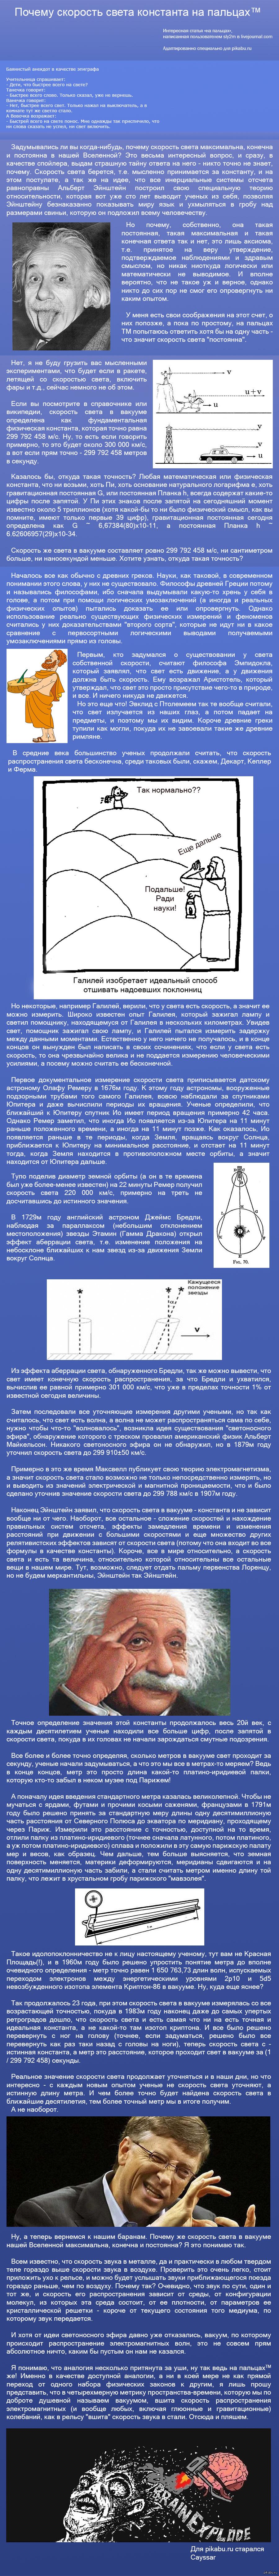 https://cs6.pikabu.ru/post_img/big/2015/07/21/9/1437491489_762774335.jpg